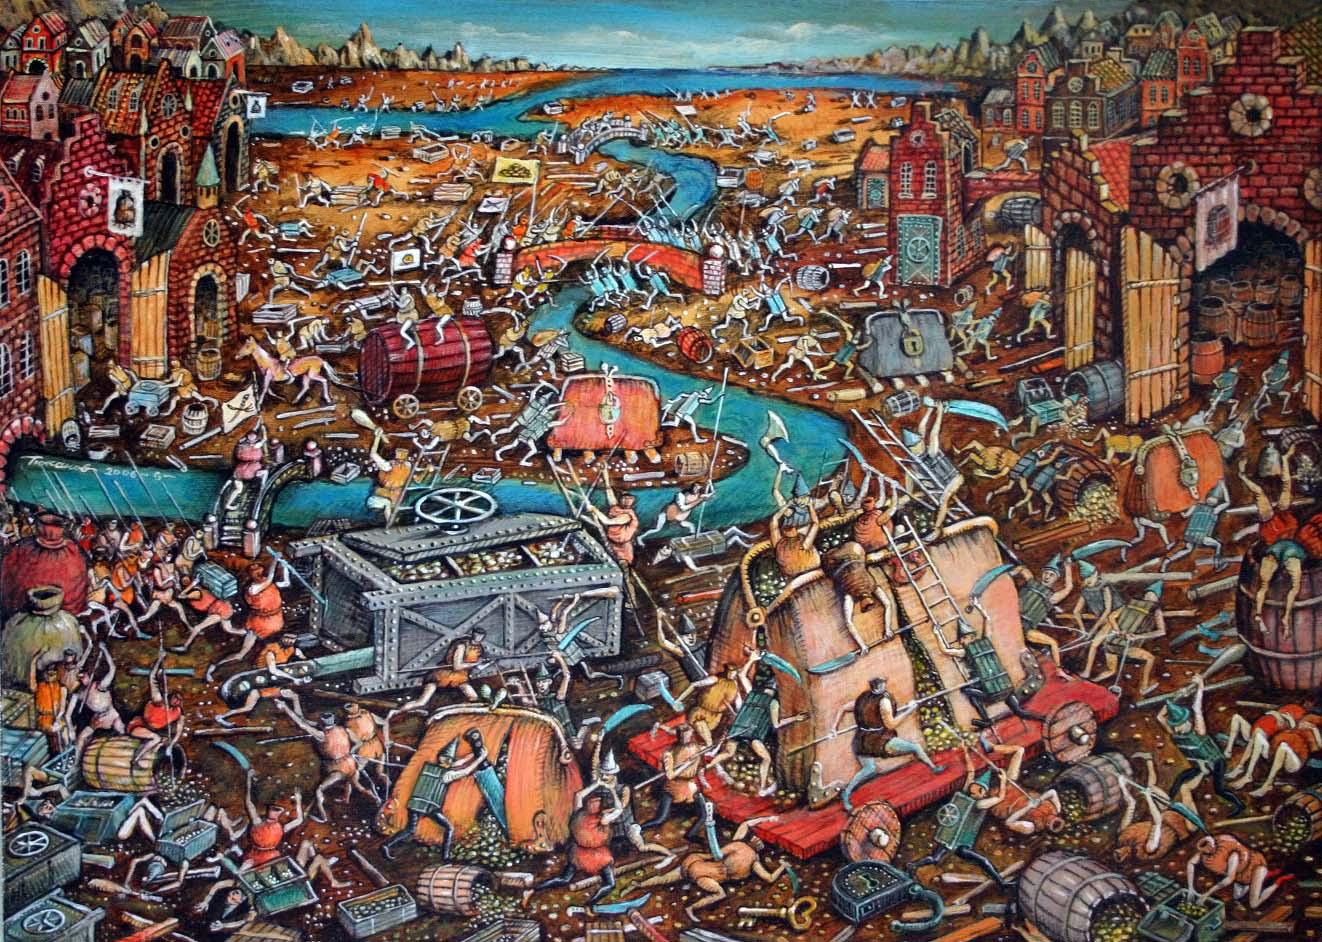 Sergey Tyukanov - Battle Of Money Sacks And Safes, 2006